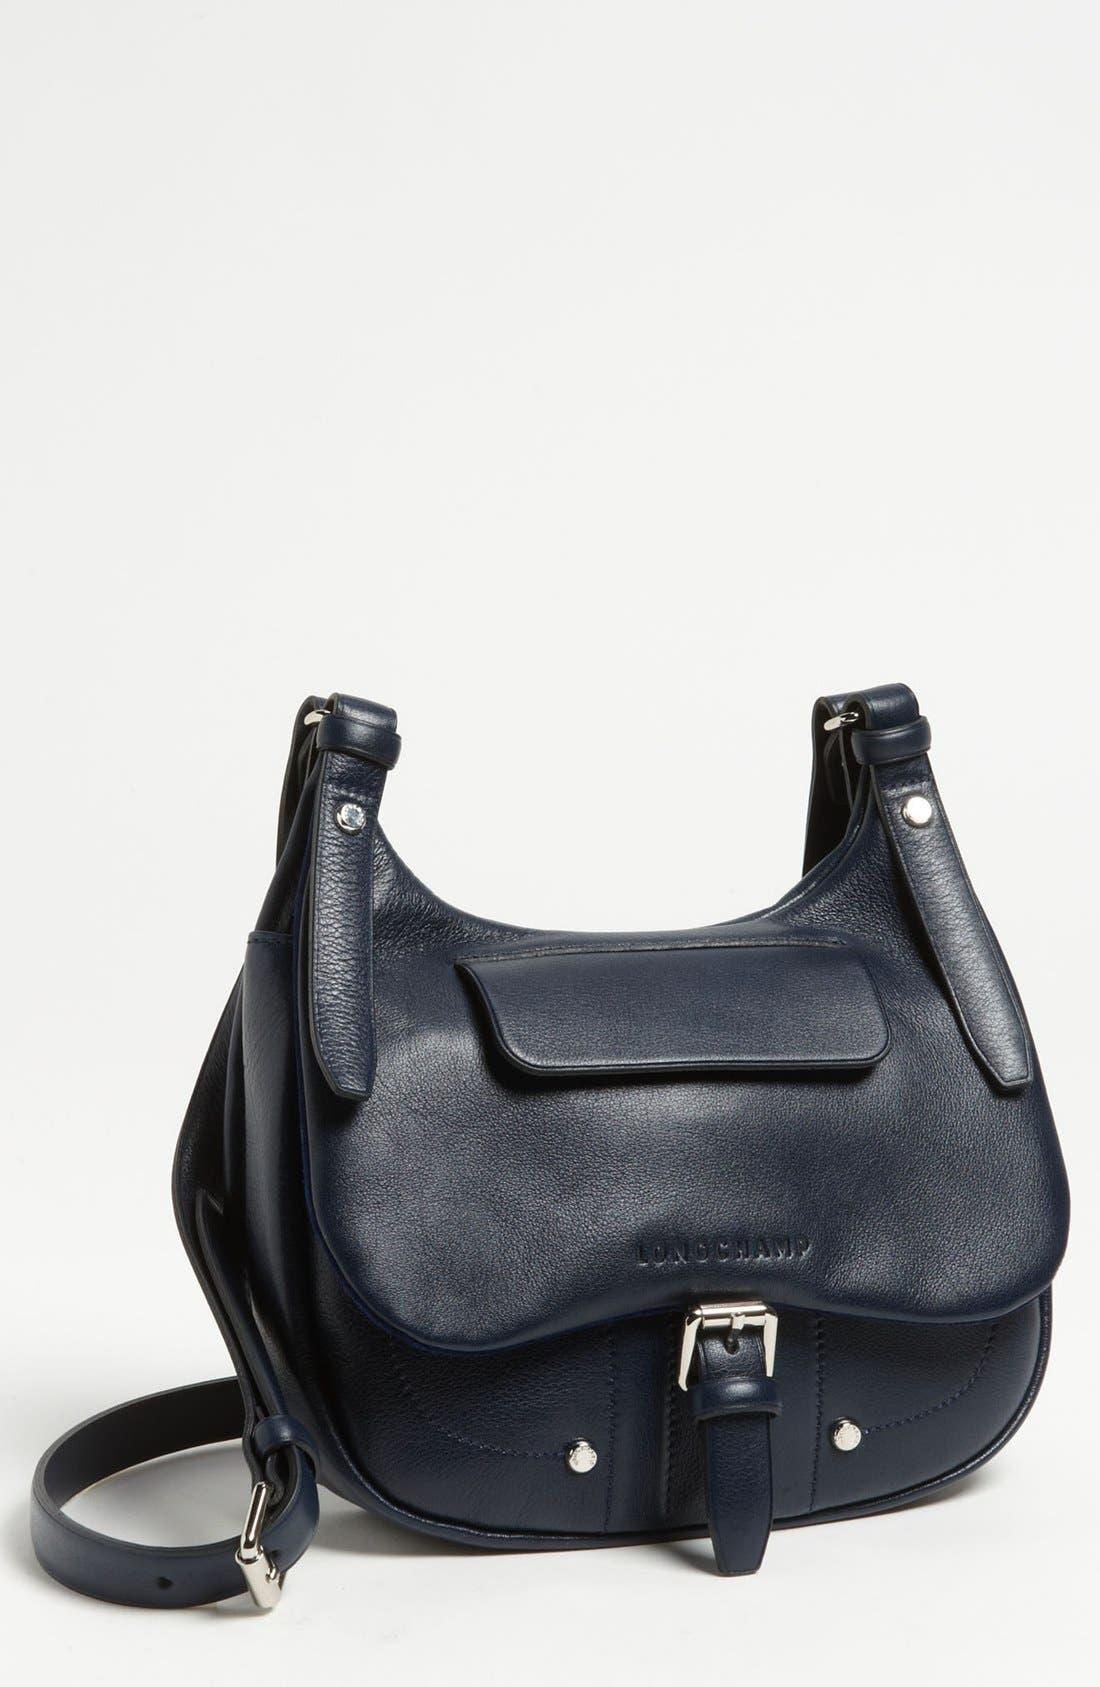 Main Image - Longchamp 'Balzane - Small' Crossbody Bag